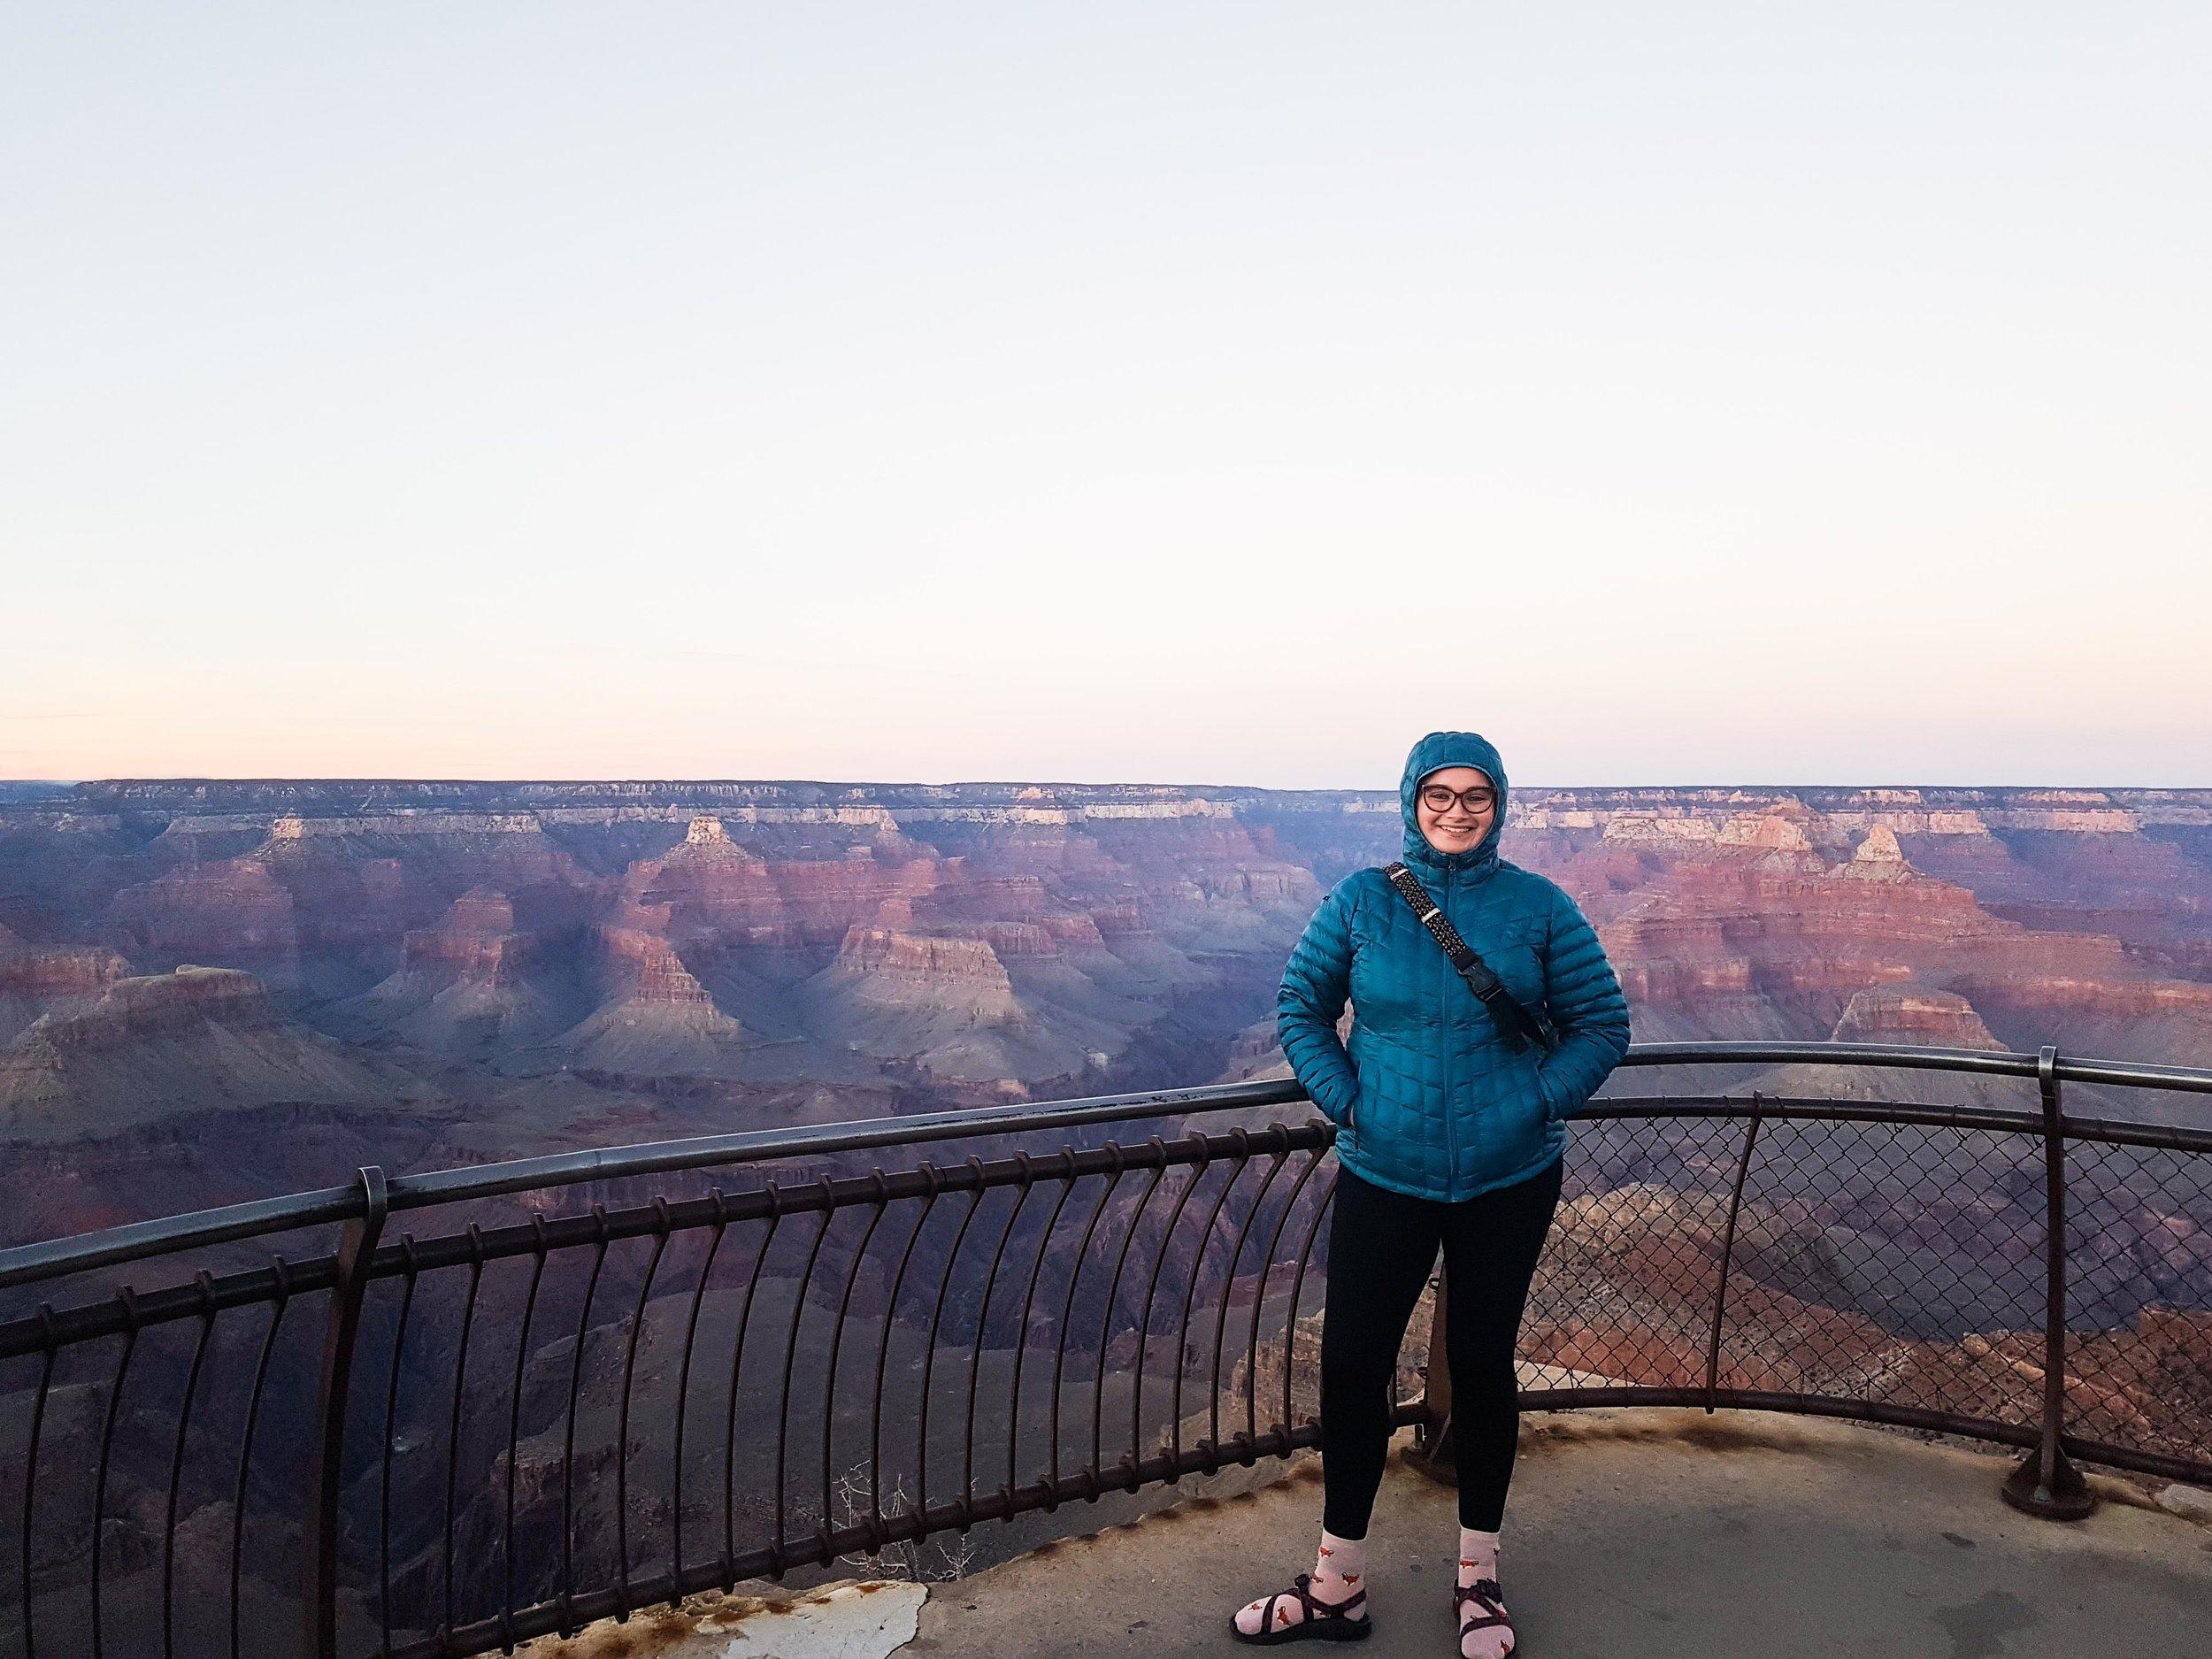 christina gray grayt at the grand canyon smiling woman dusk kavu bag marmot jacket